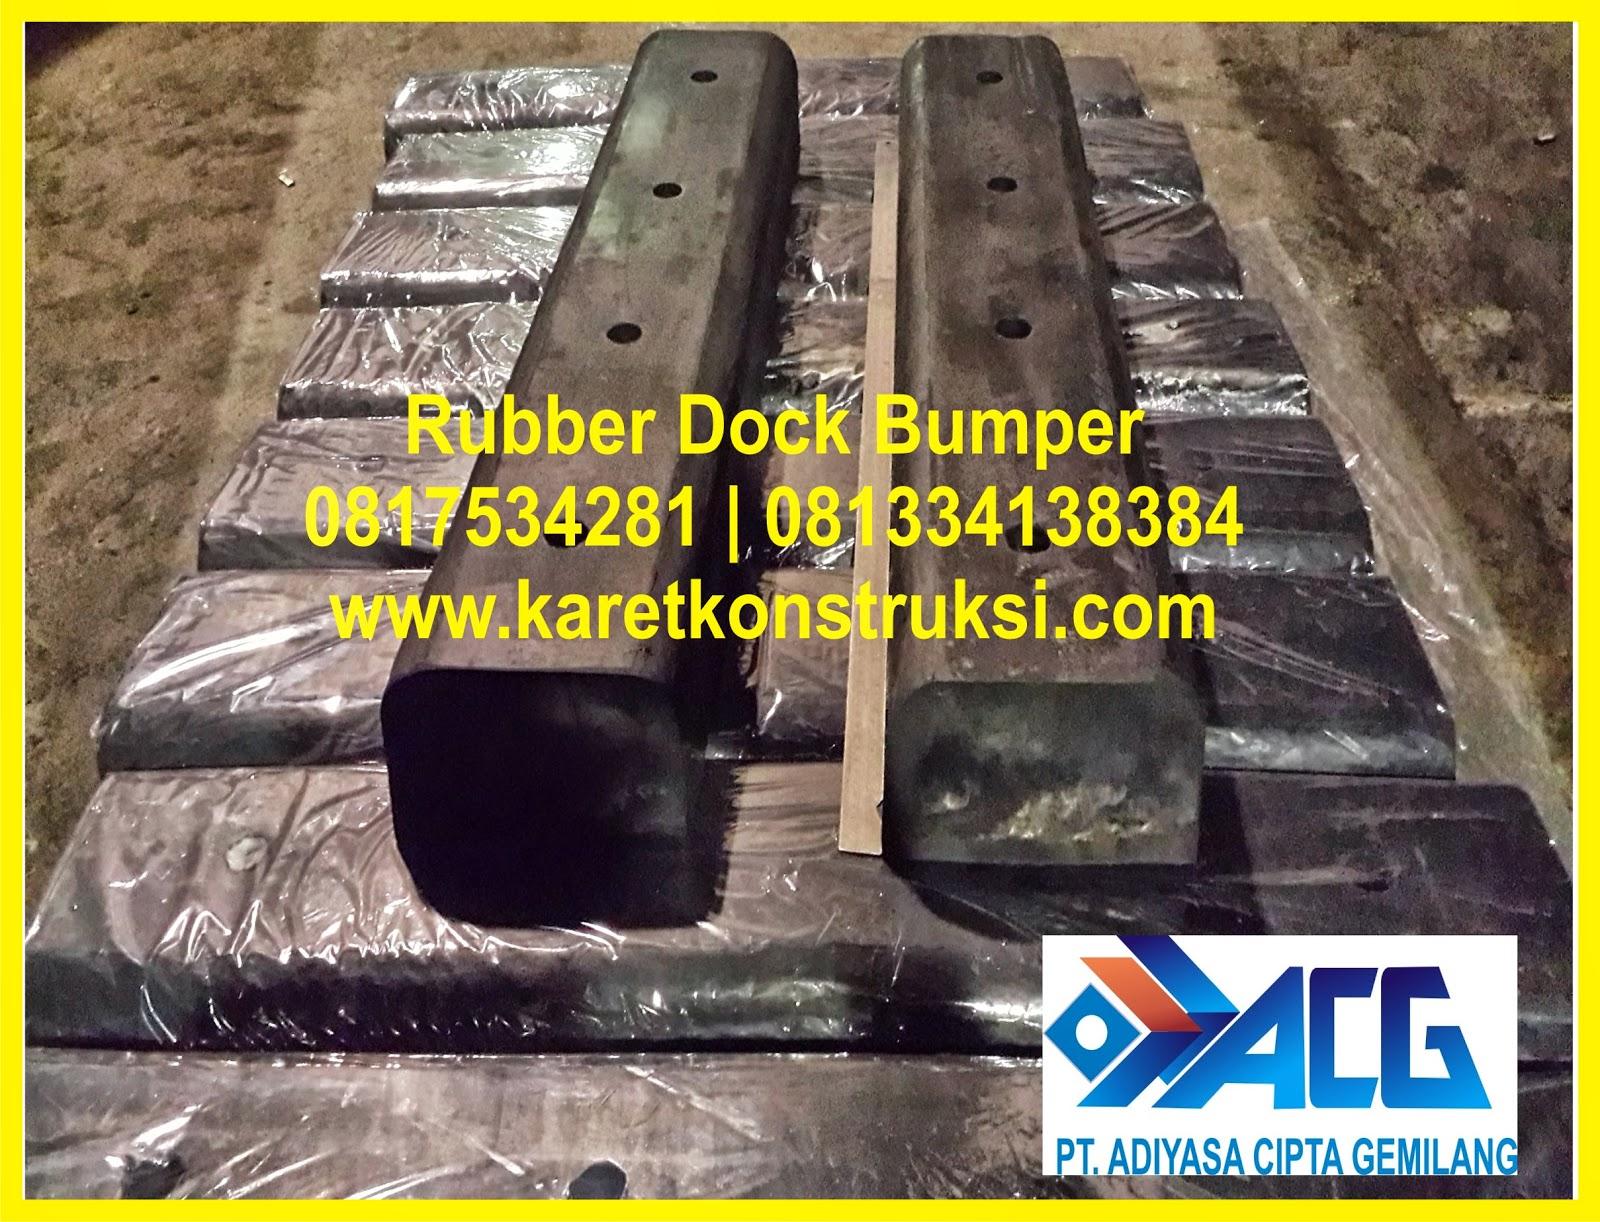 Jual rubber dock , Harga rubber dock bumper , rubber dock fender , rubber dock bumpers truck , rubber dock bumpers di Jakarta Surabaya